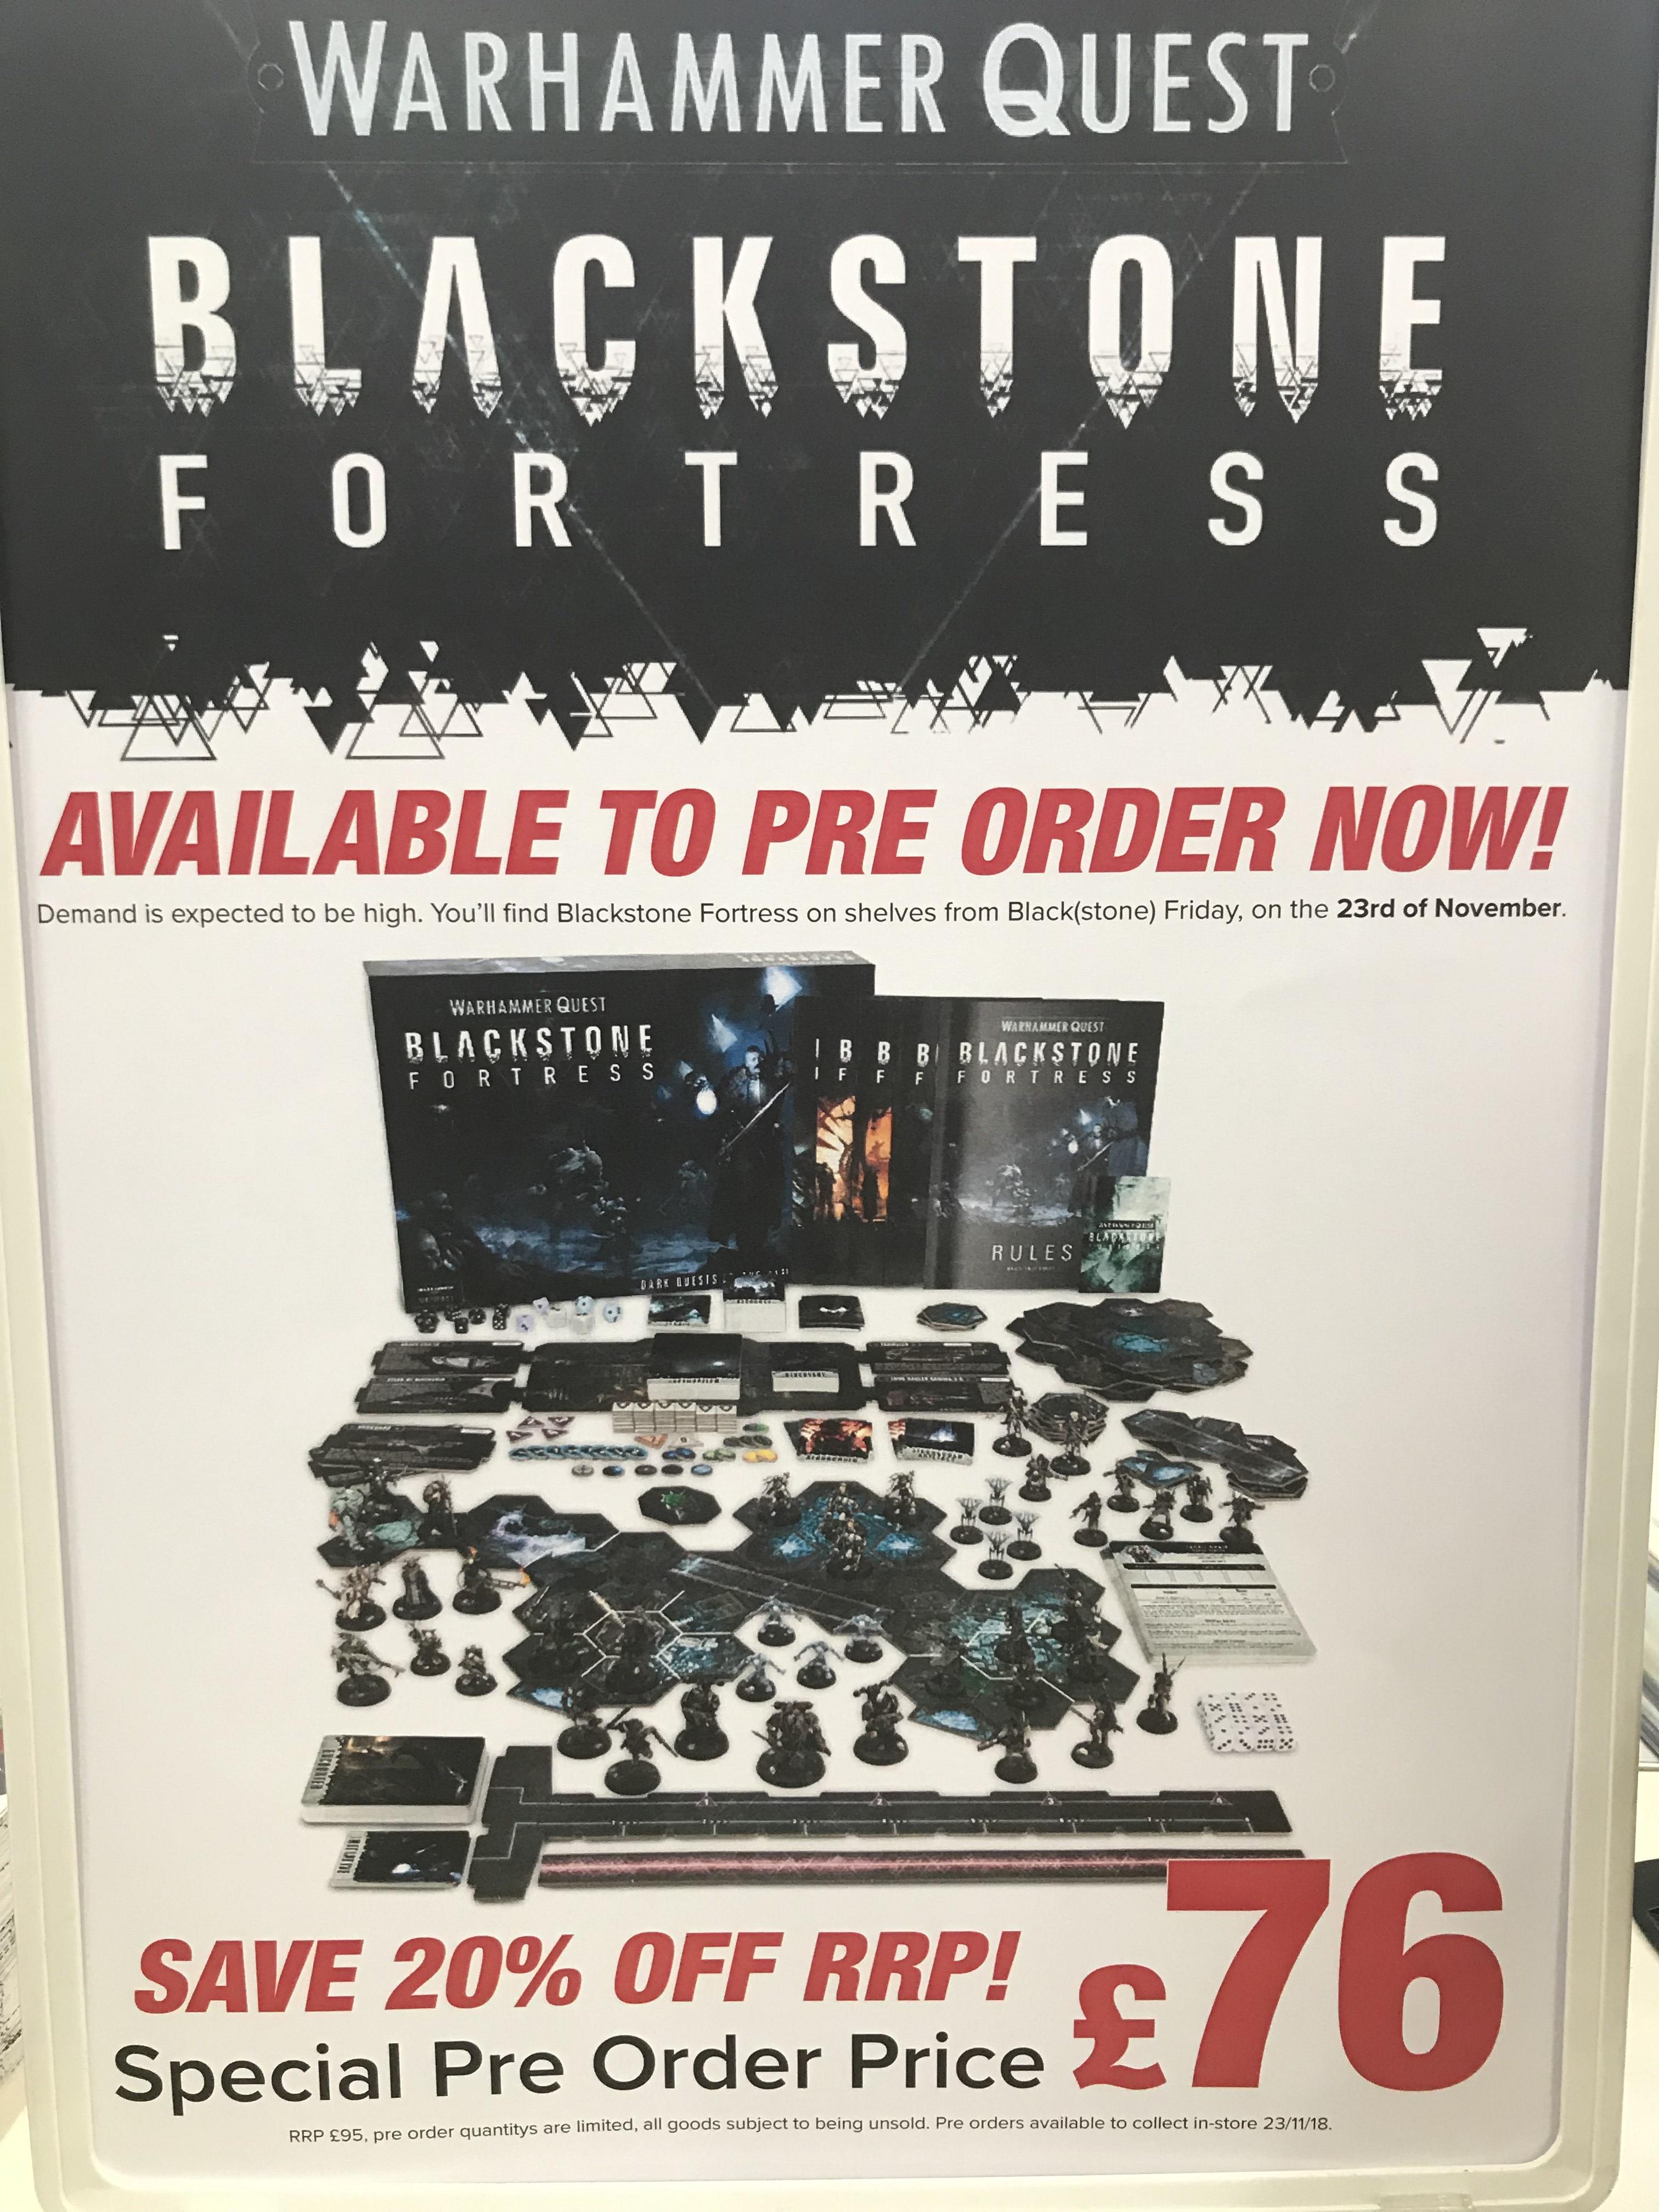 Blackstone Fortress - £76 pre order instore @ Boyes